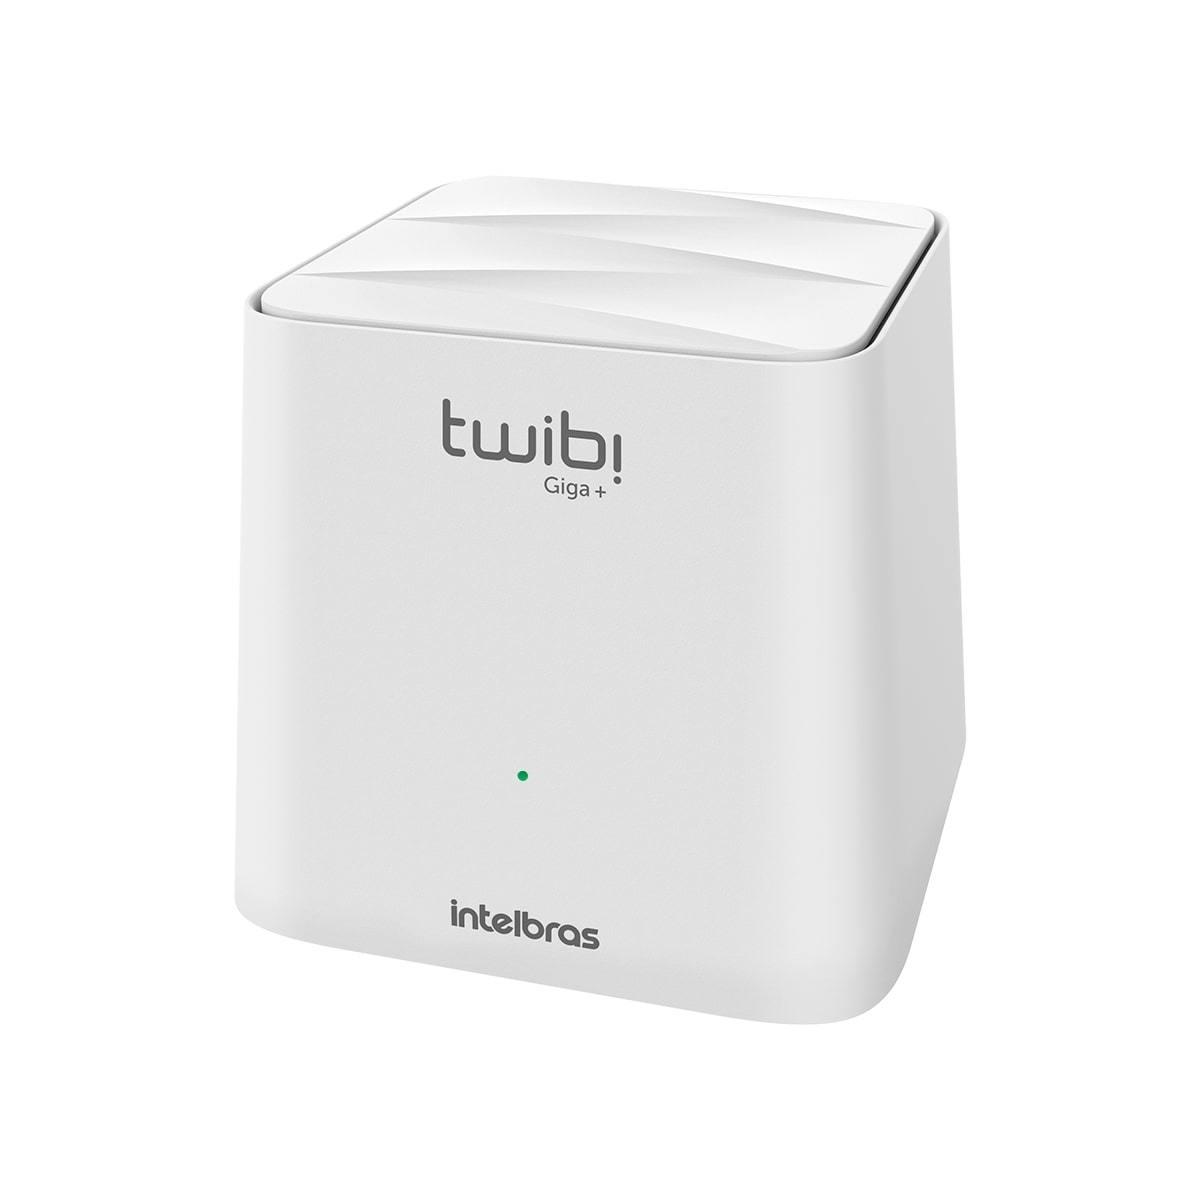 Kit Roteador Mesh Twibi Giga+ Intelbras